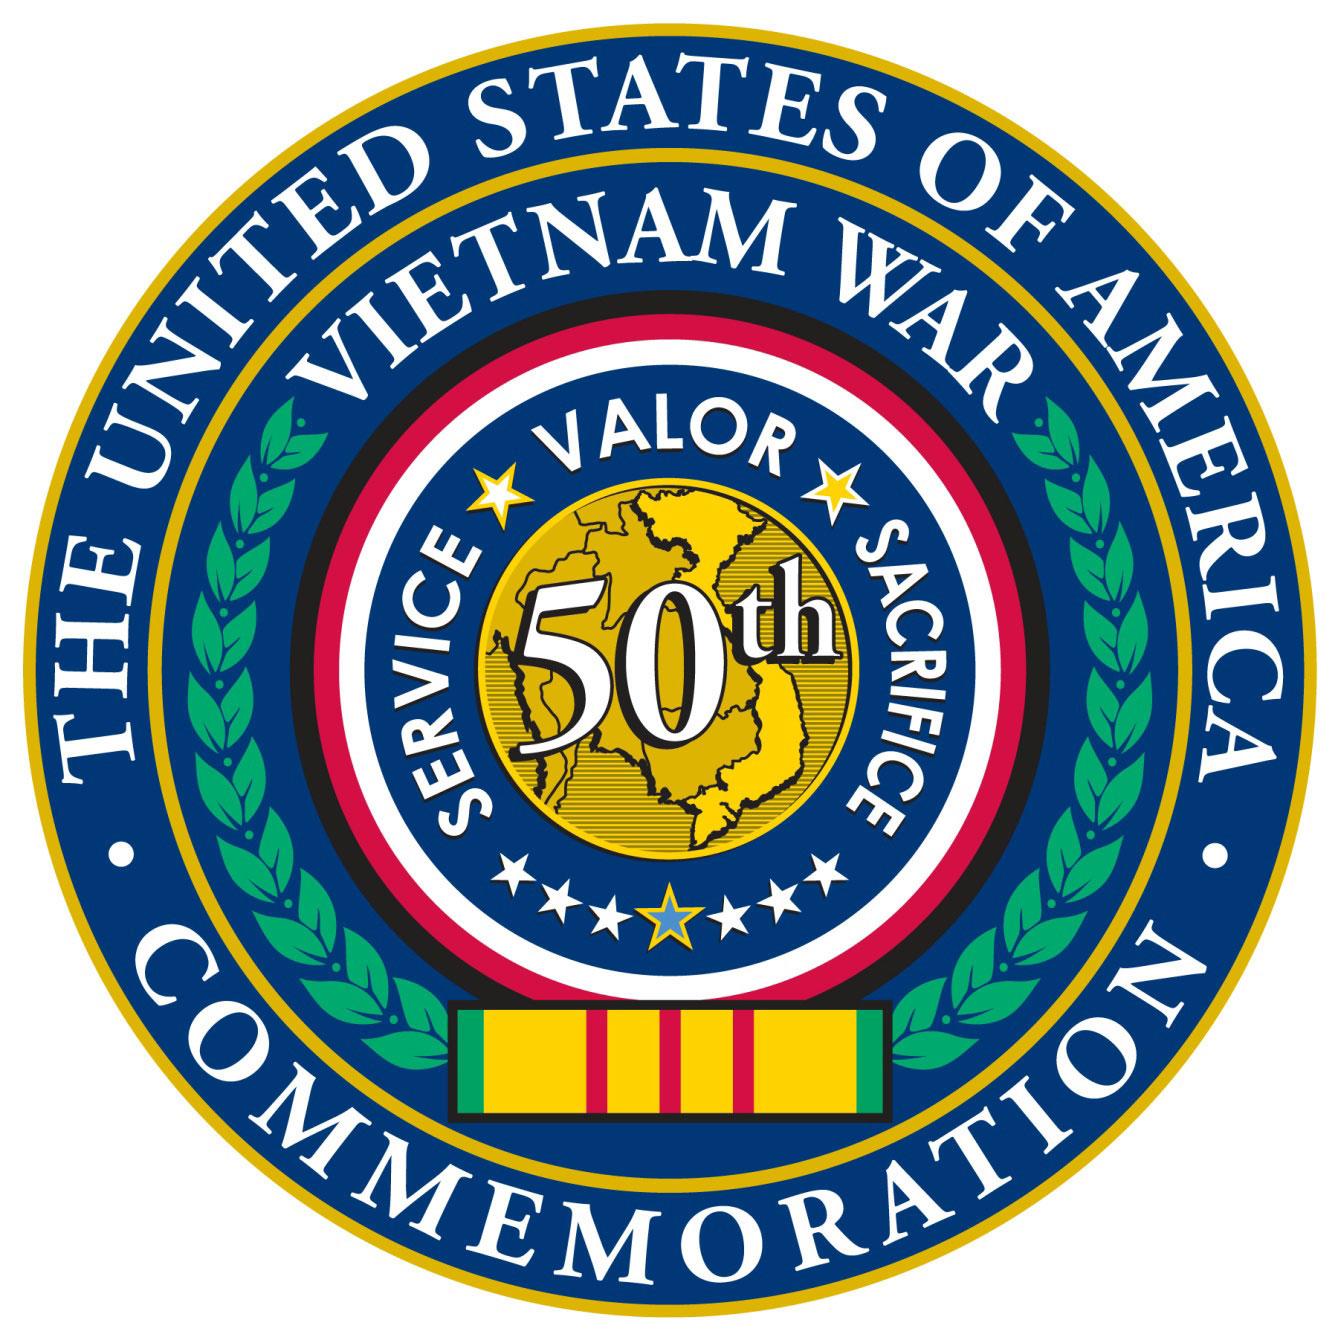 50th Commemoration Seal